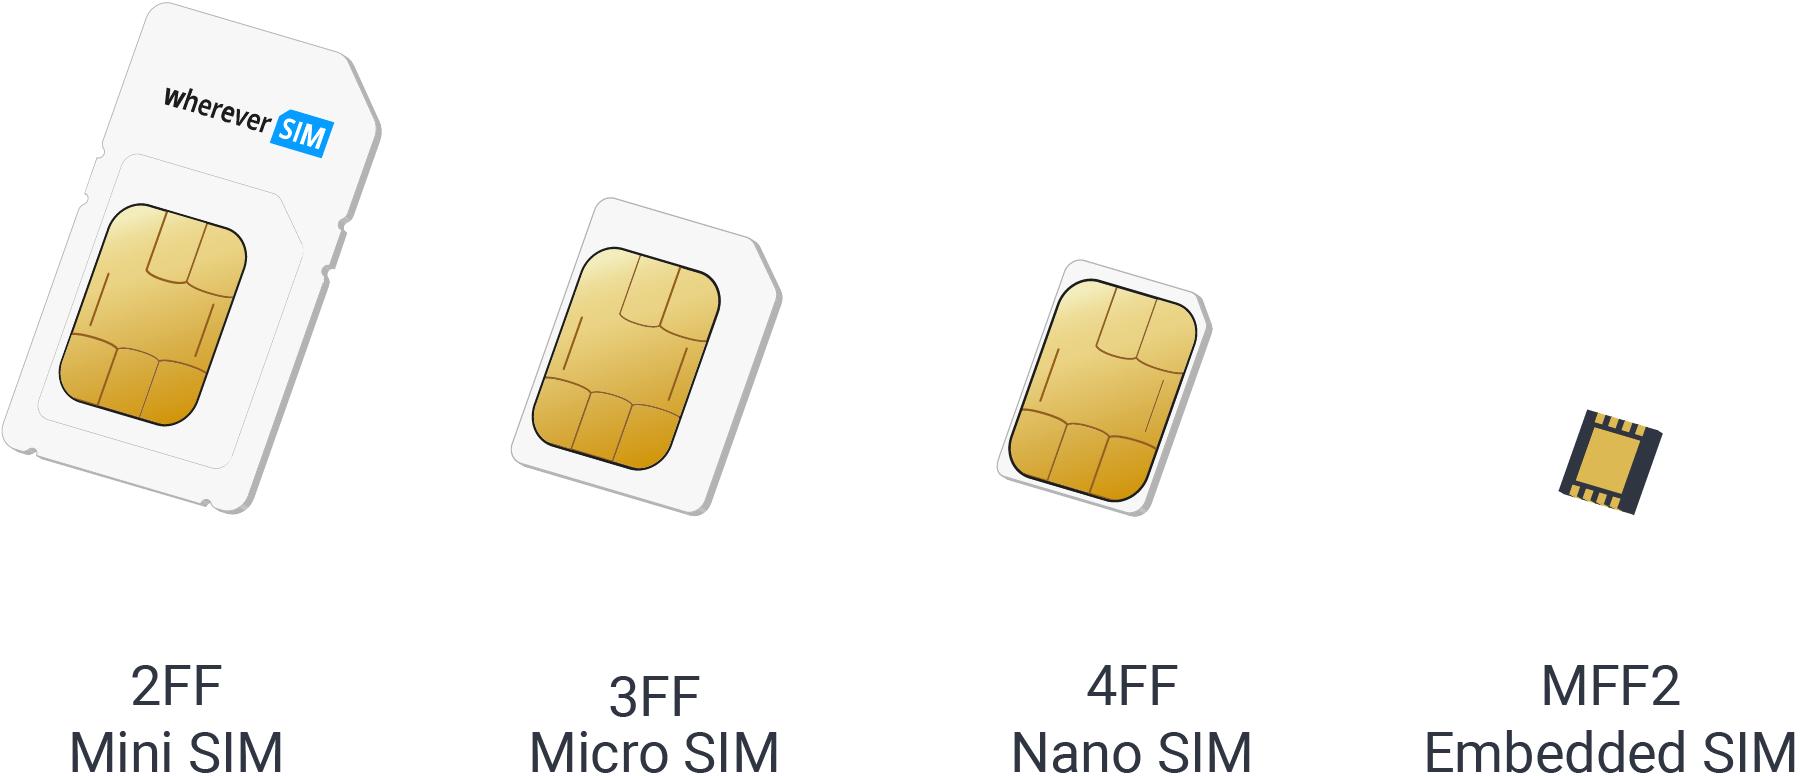 SIM formats of the whereversim